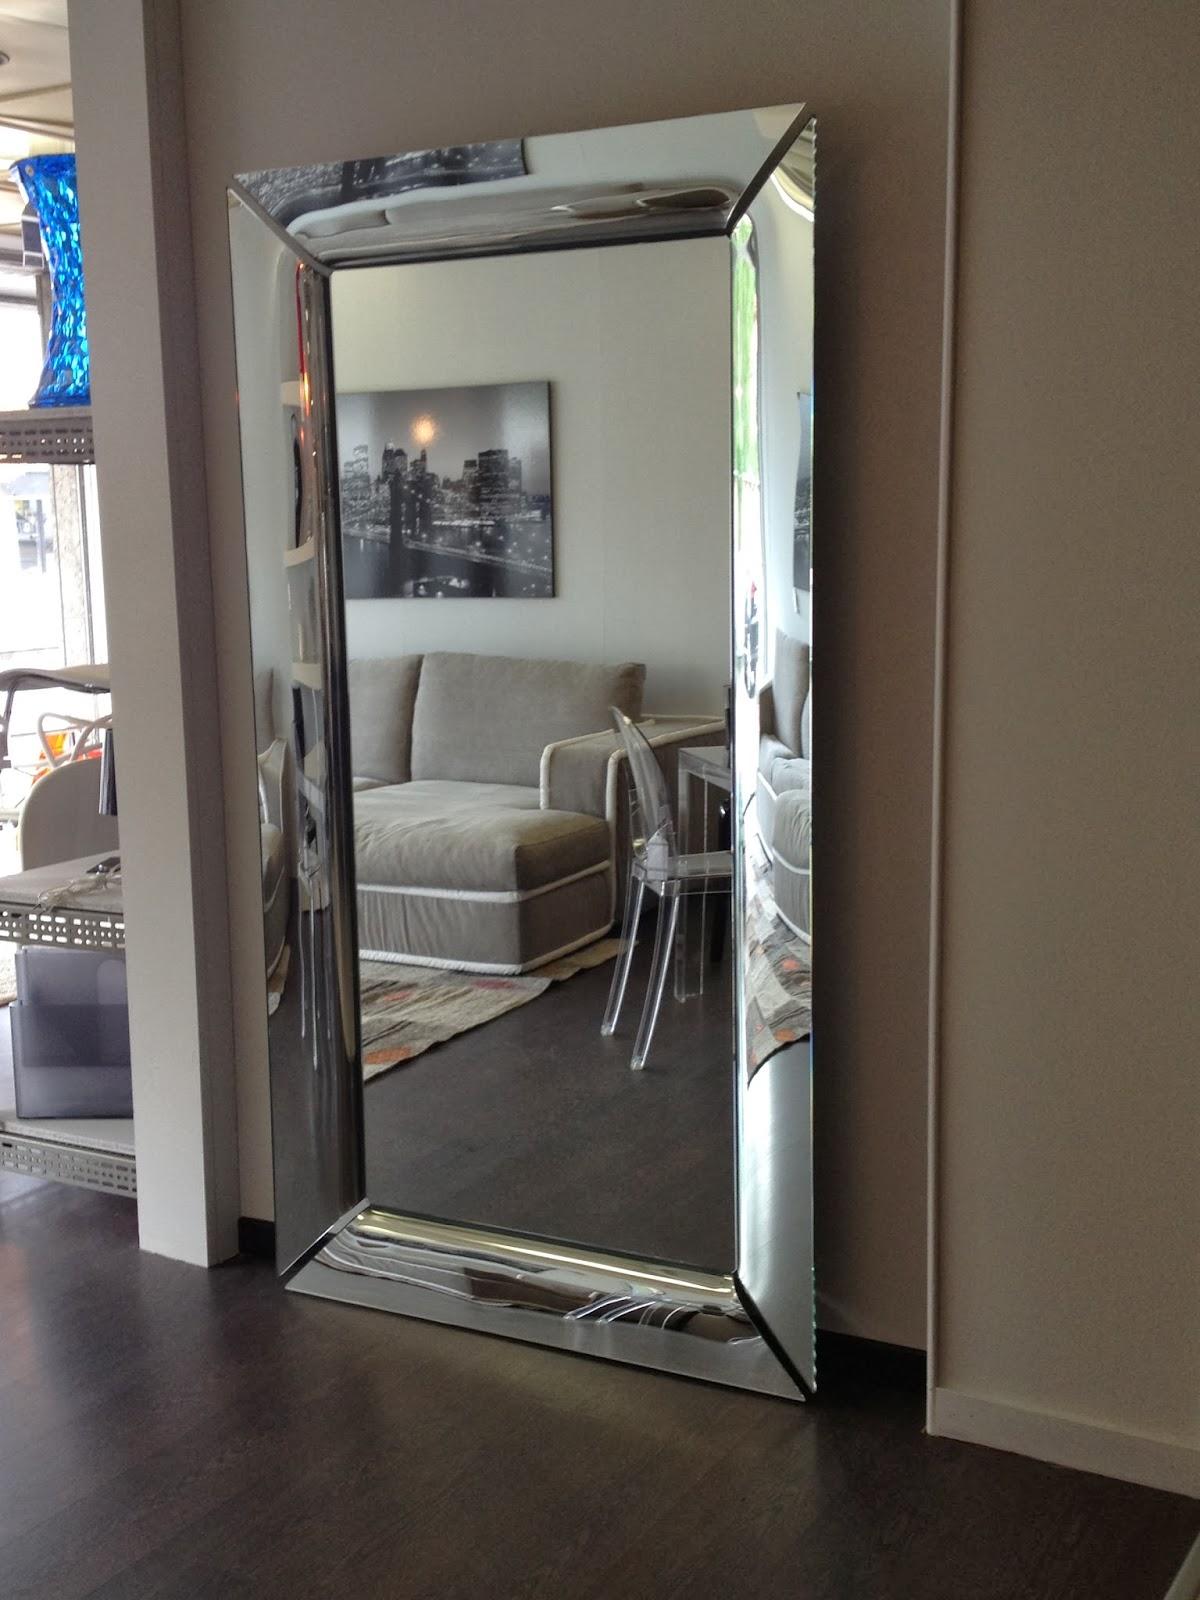 Casa di classe pi luce con i mobili specchiati for Mobili piu